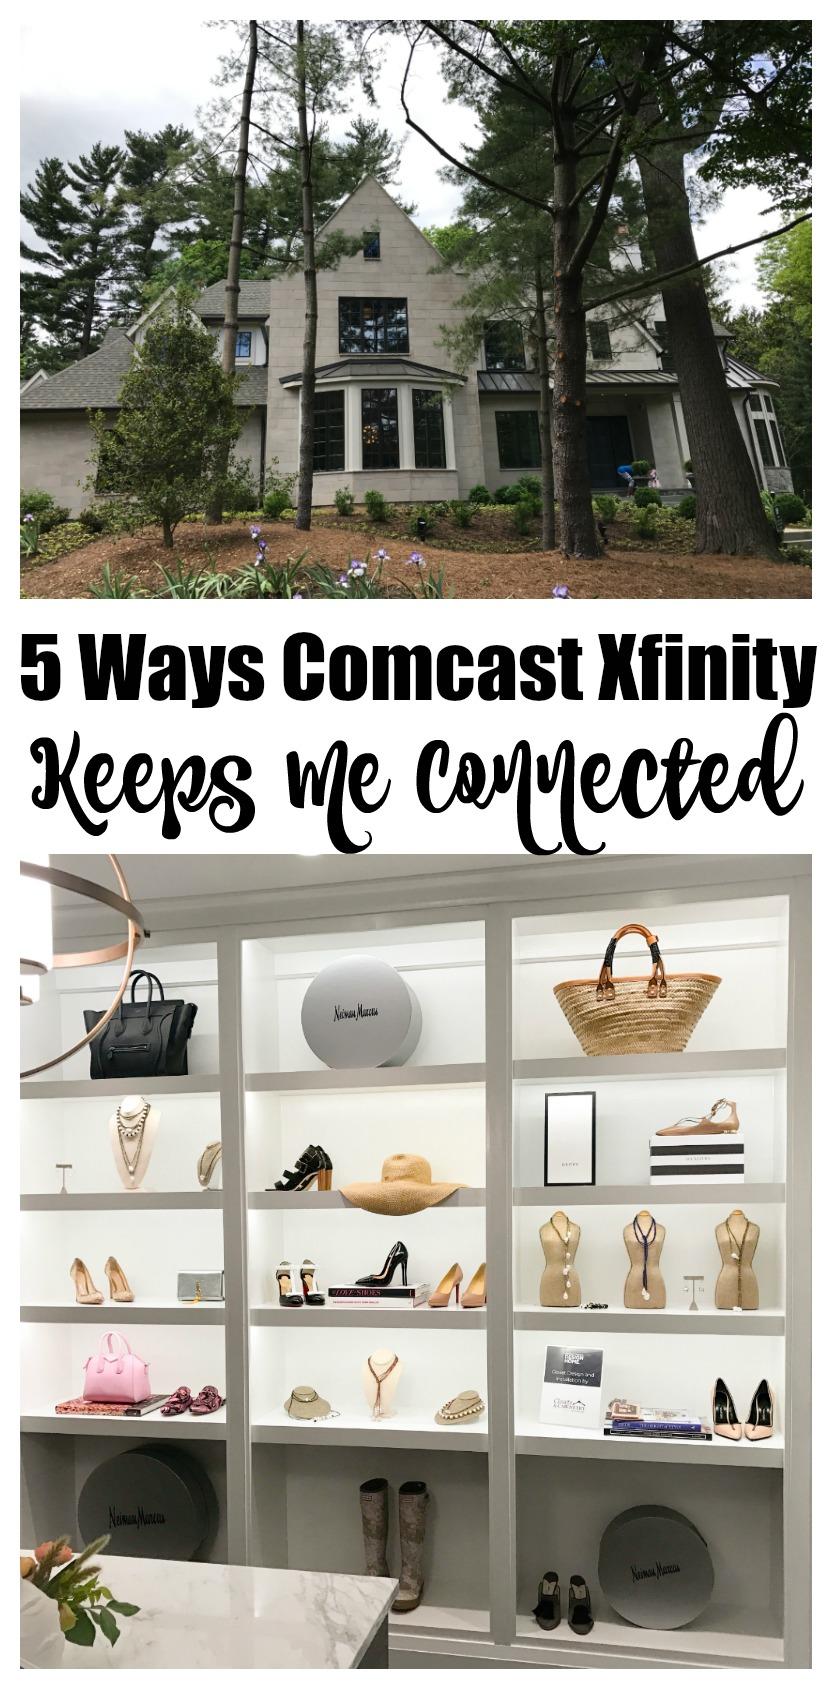 5 Ways Xfinity Keeps Me Connected